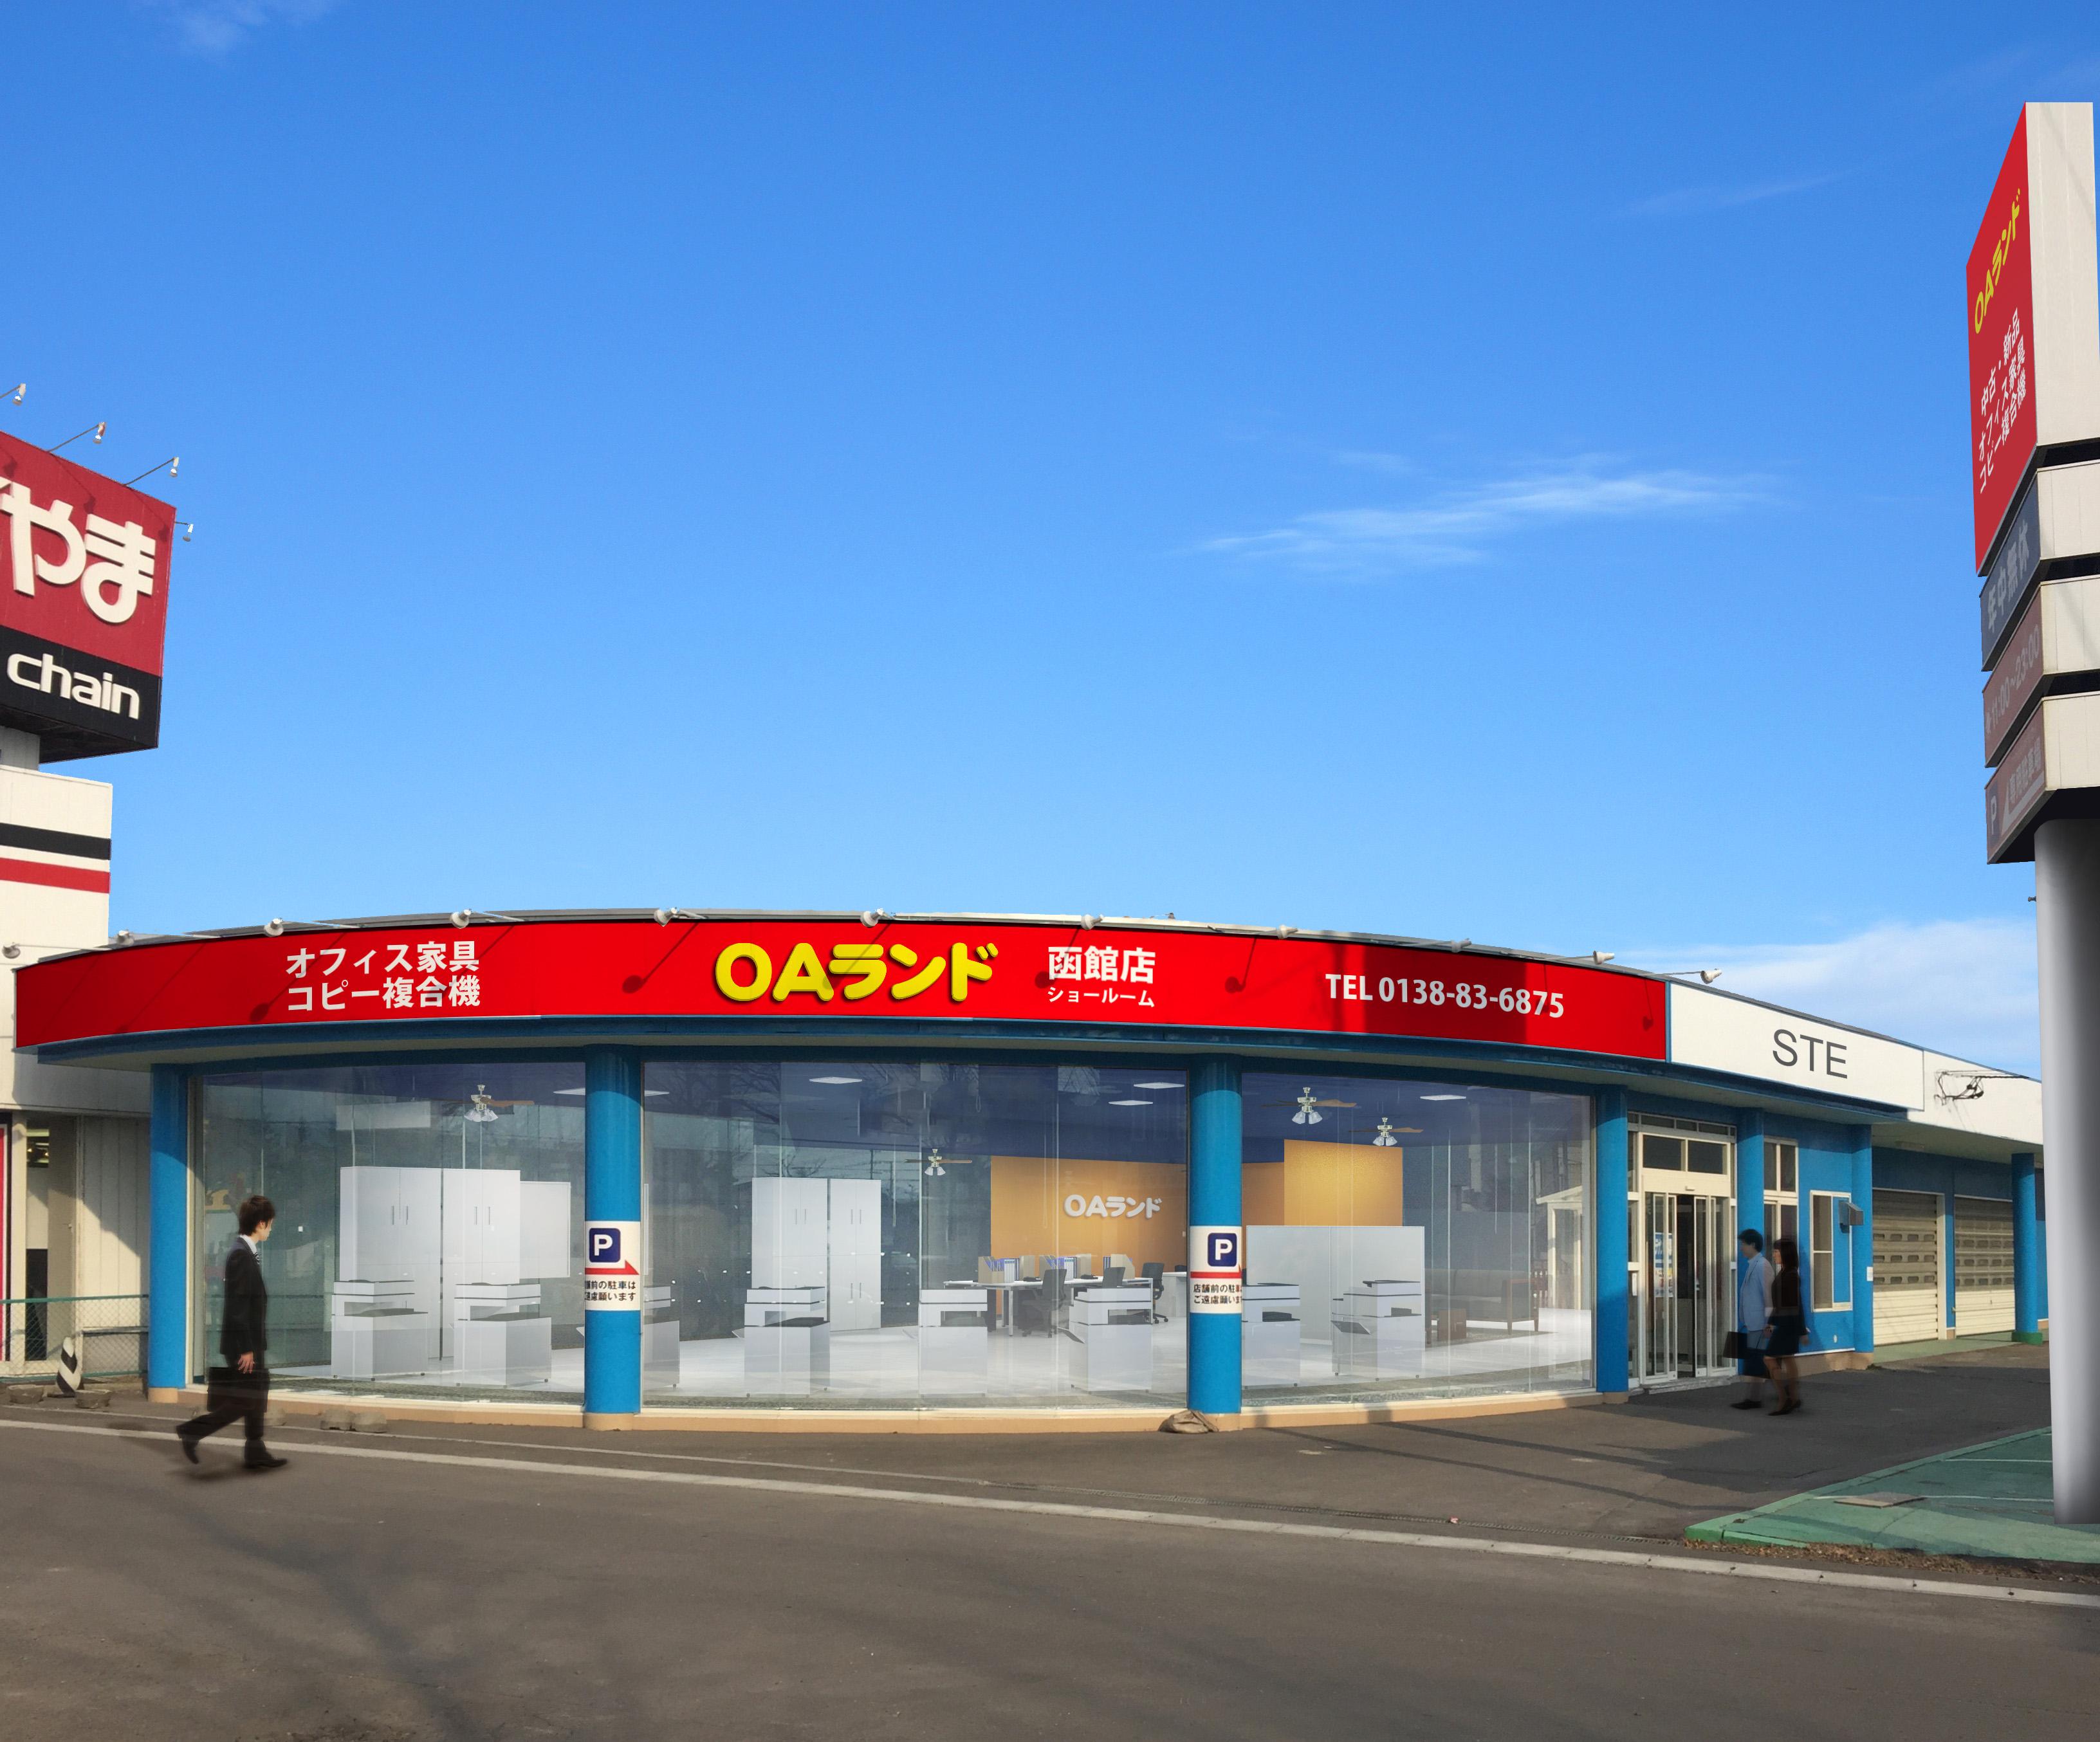 OAランド函館ショールーム 外観イメージ